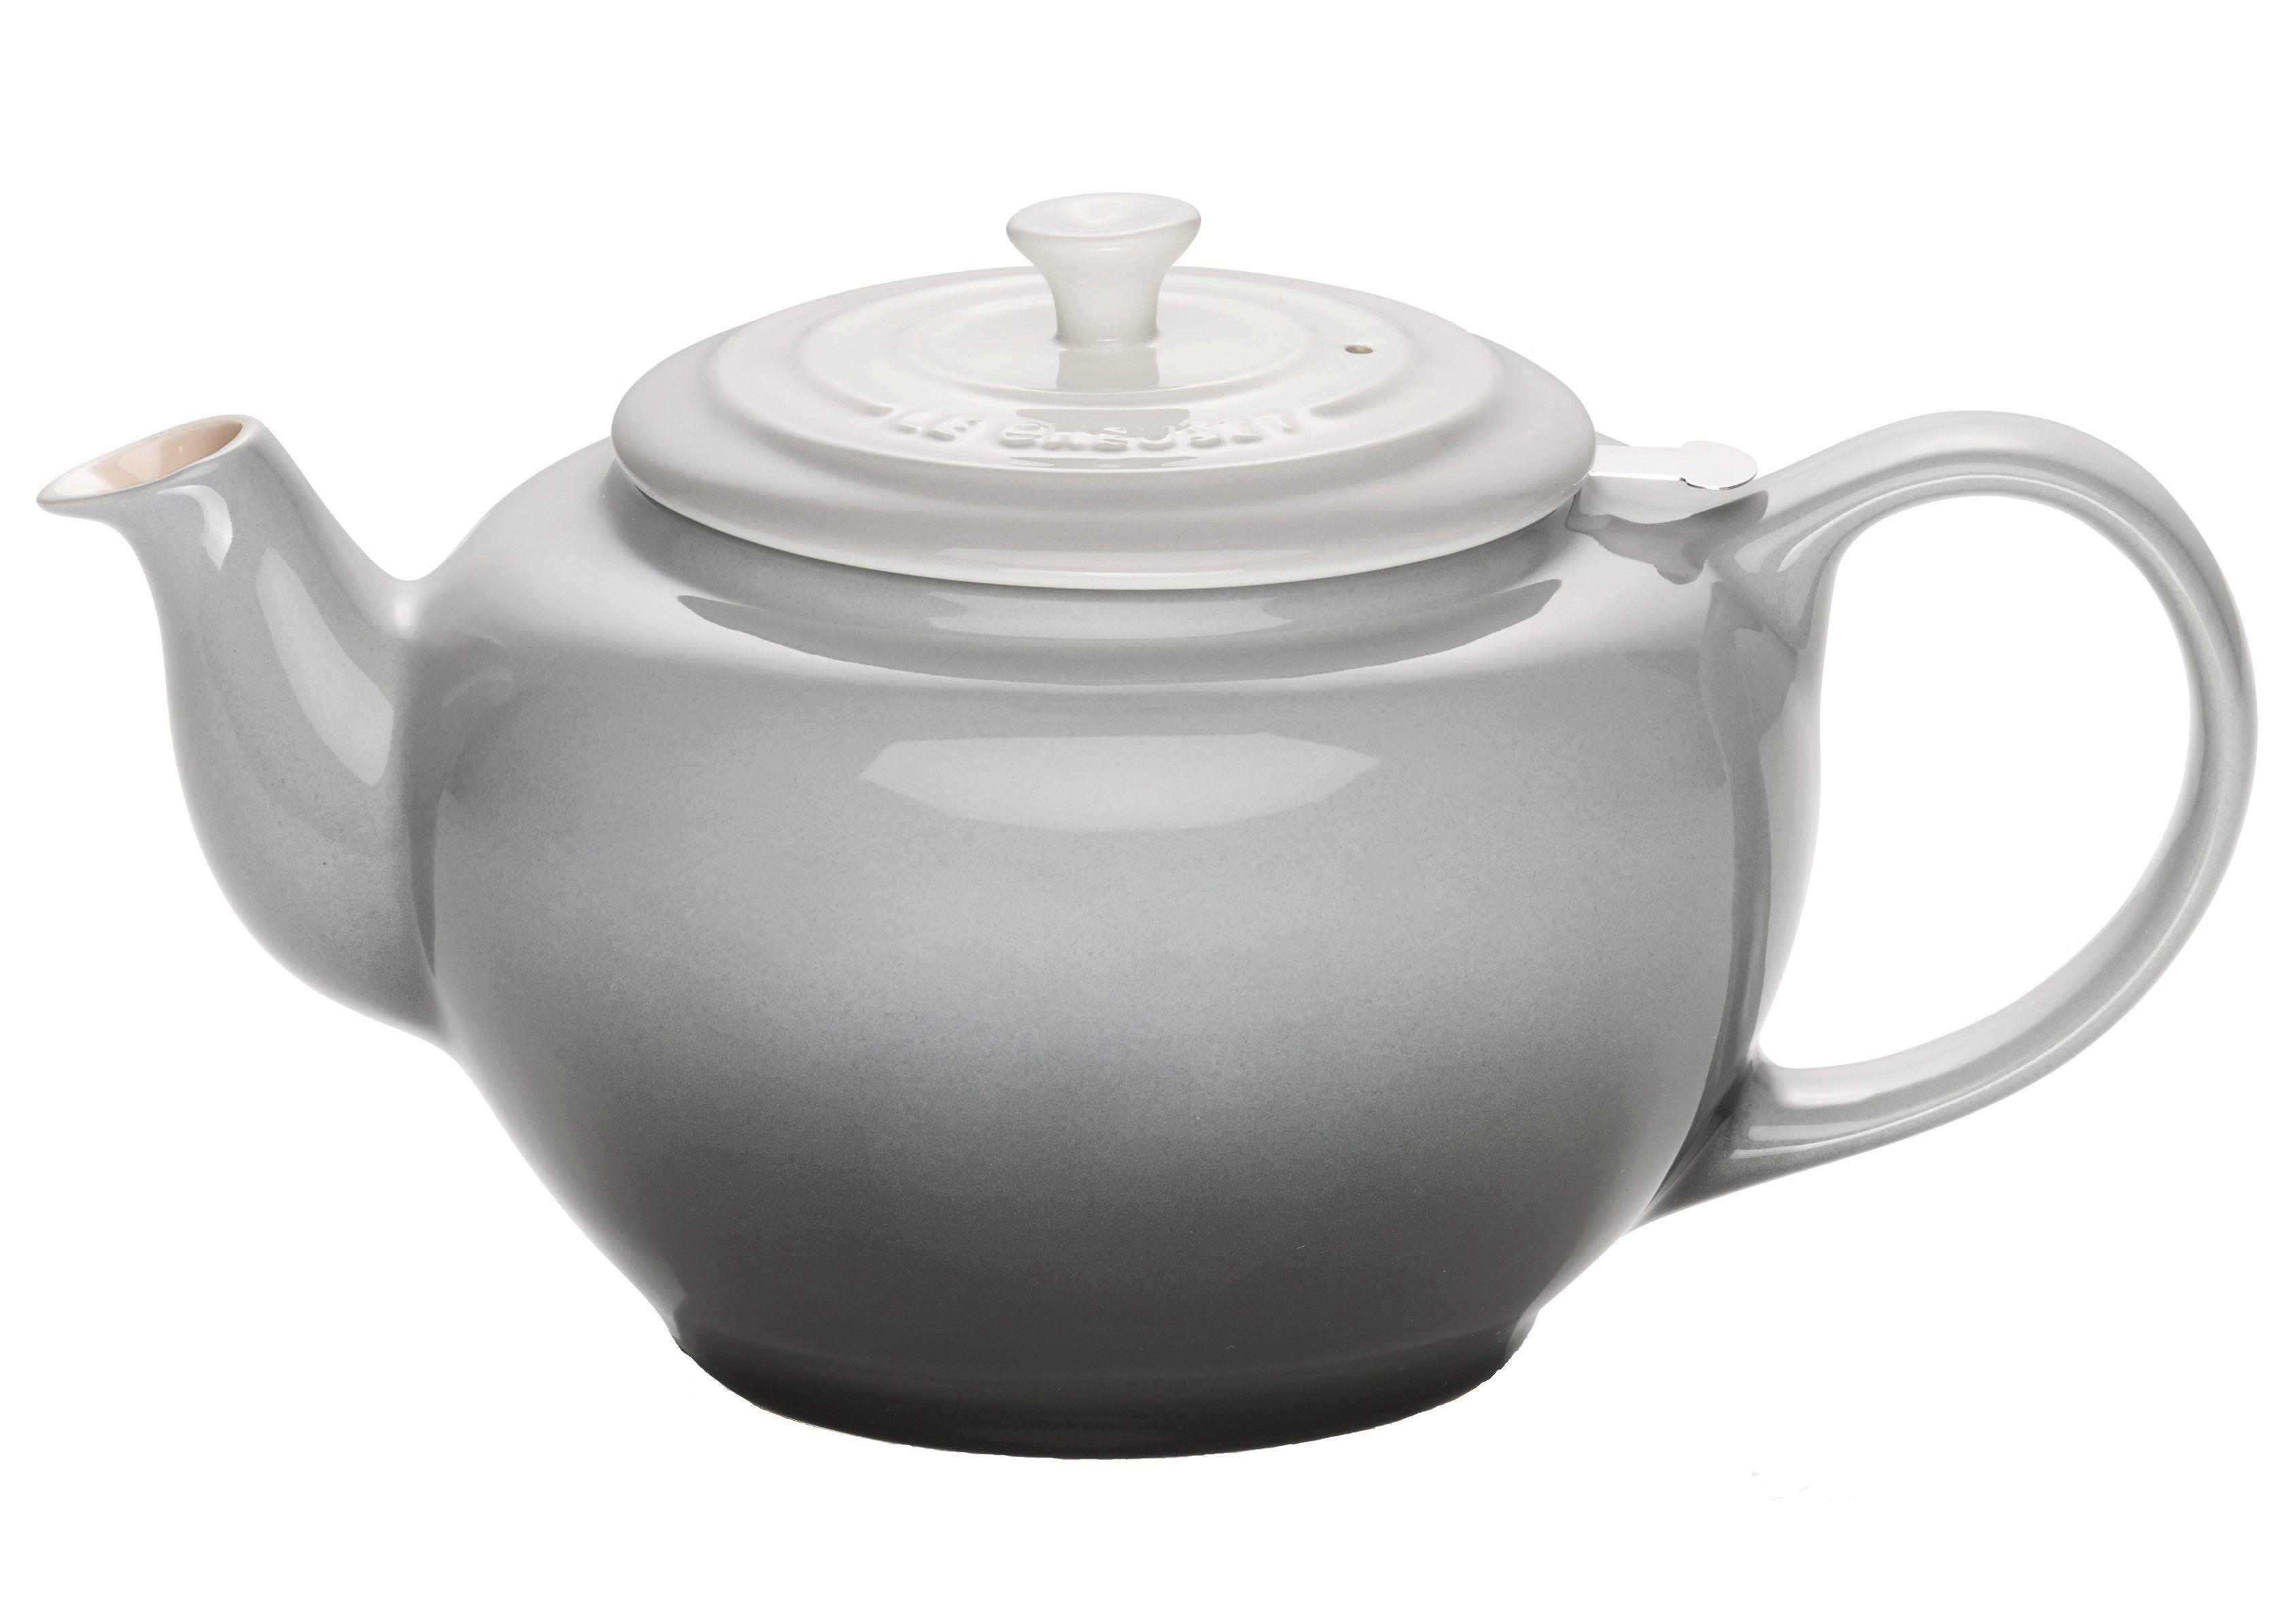 Le Creuset theepot ombre grijs 1.3 liter